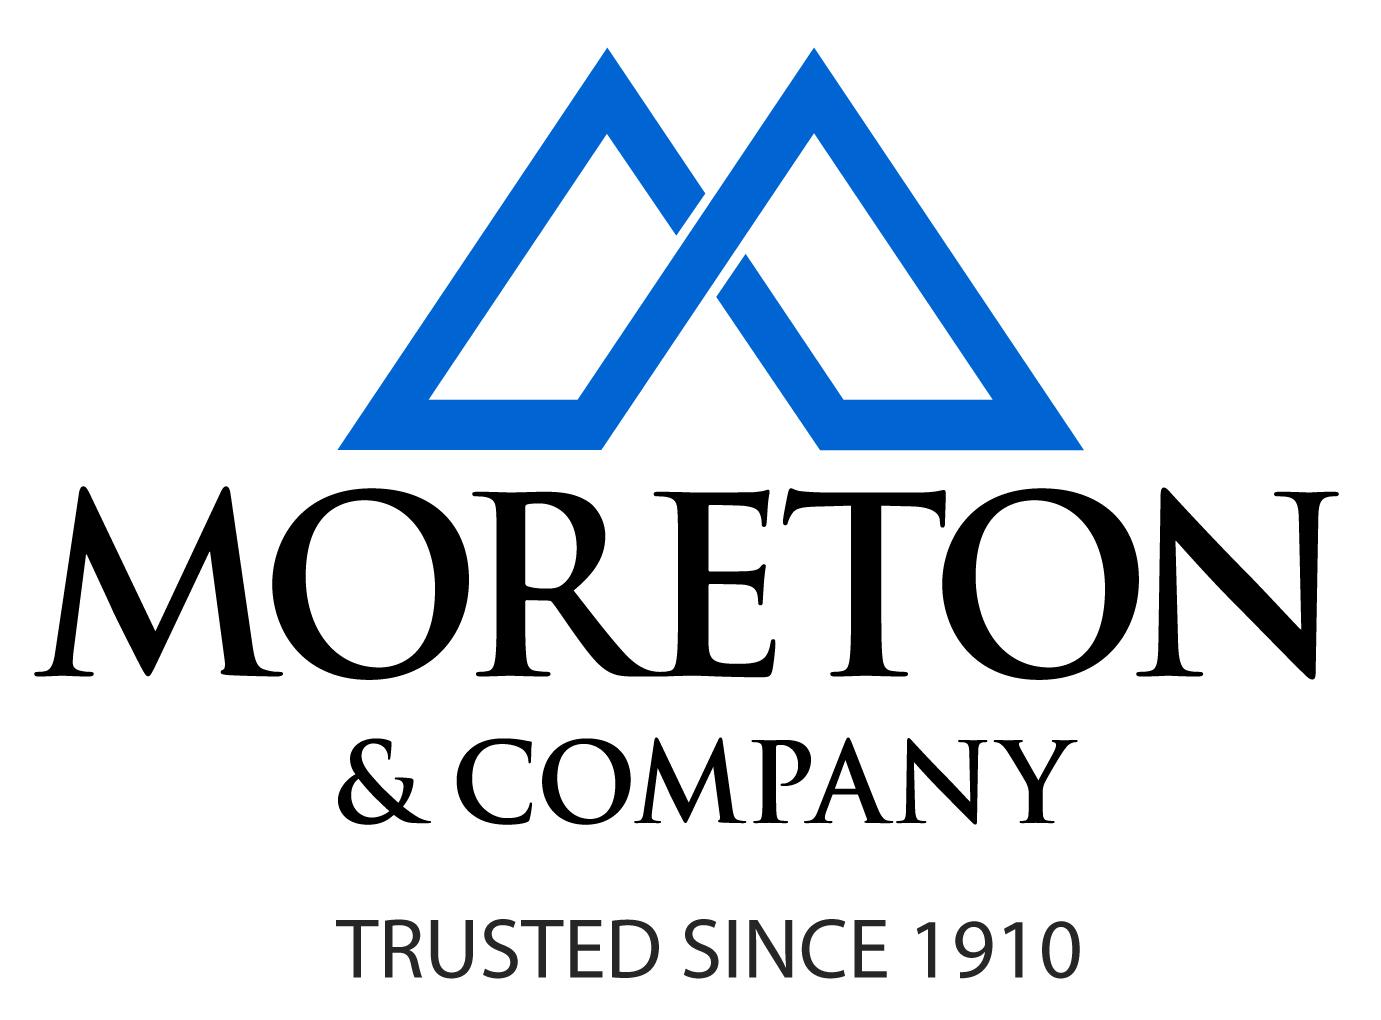 Moreton & Company